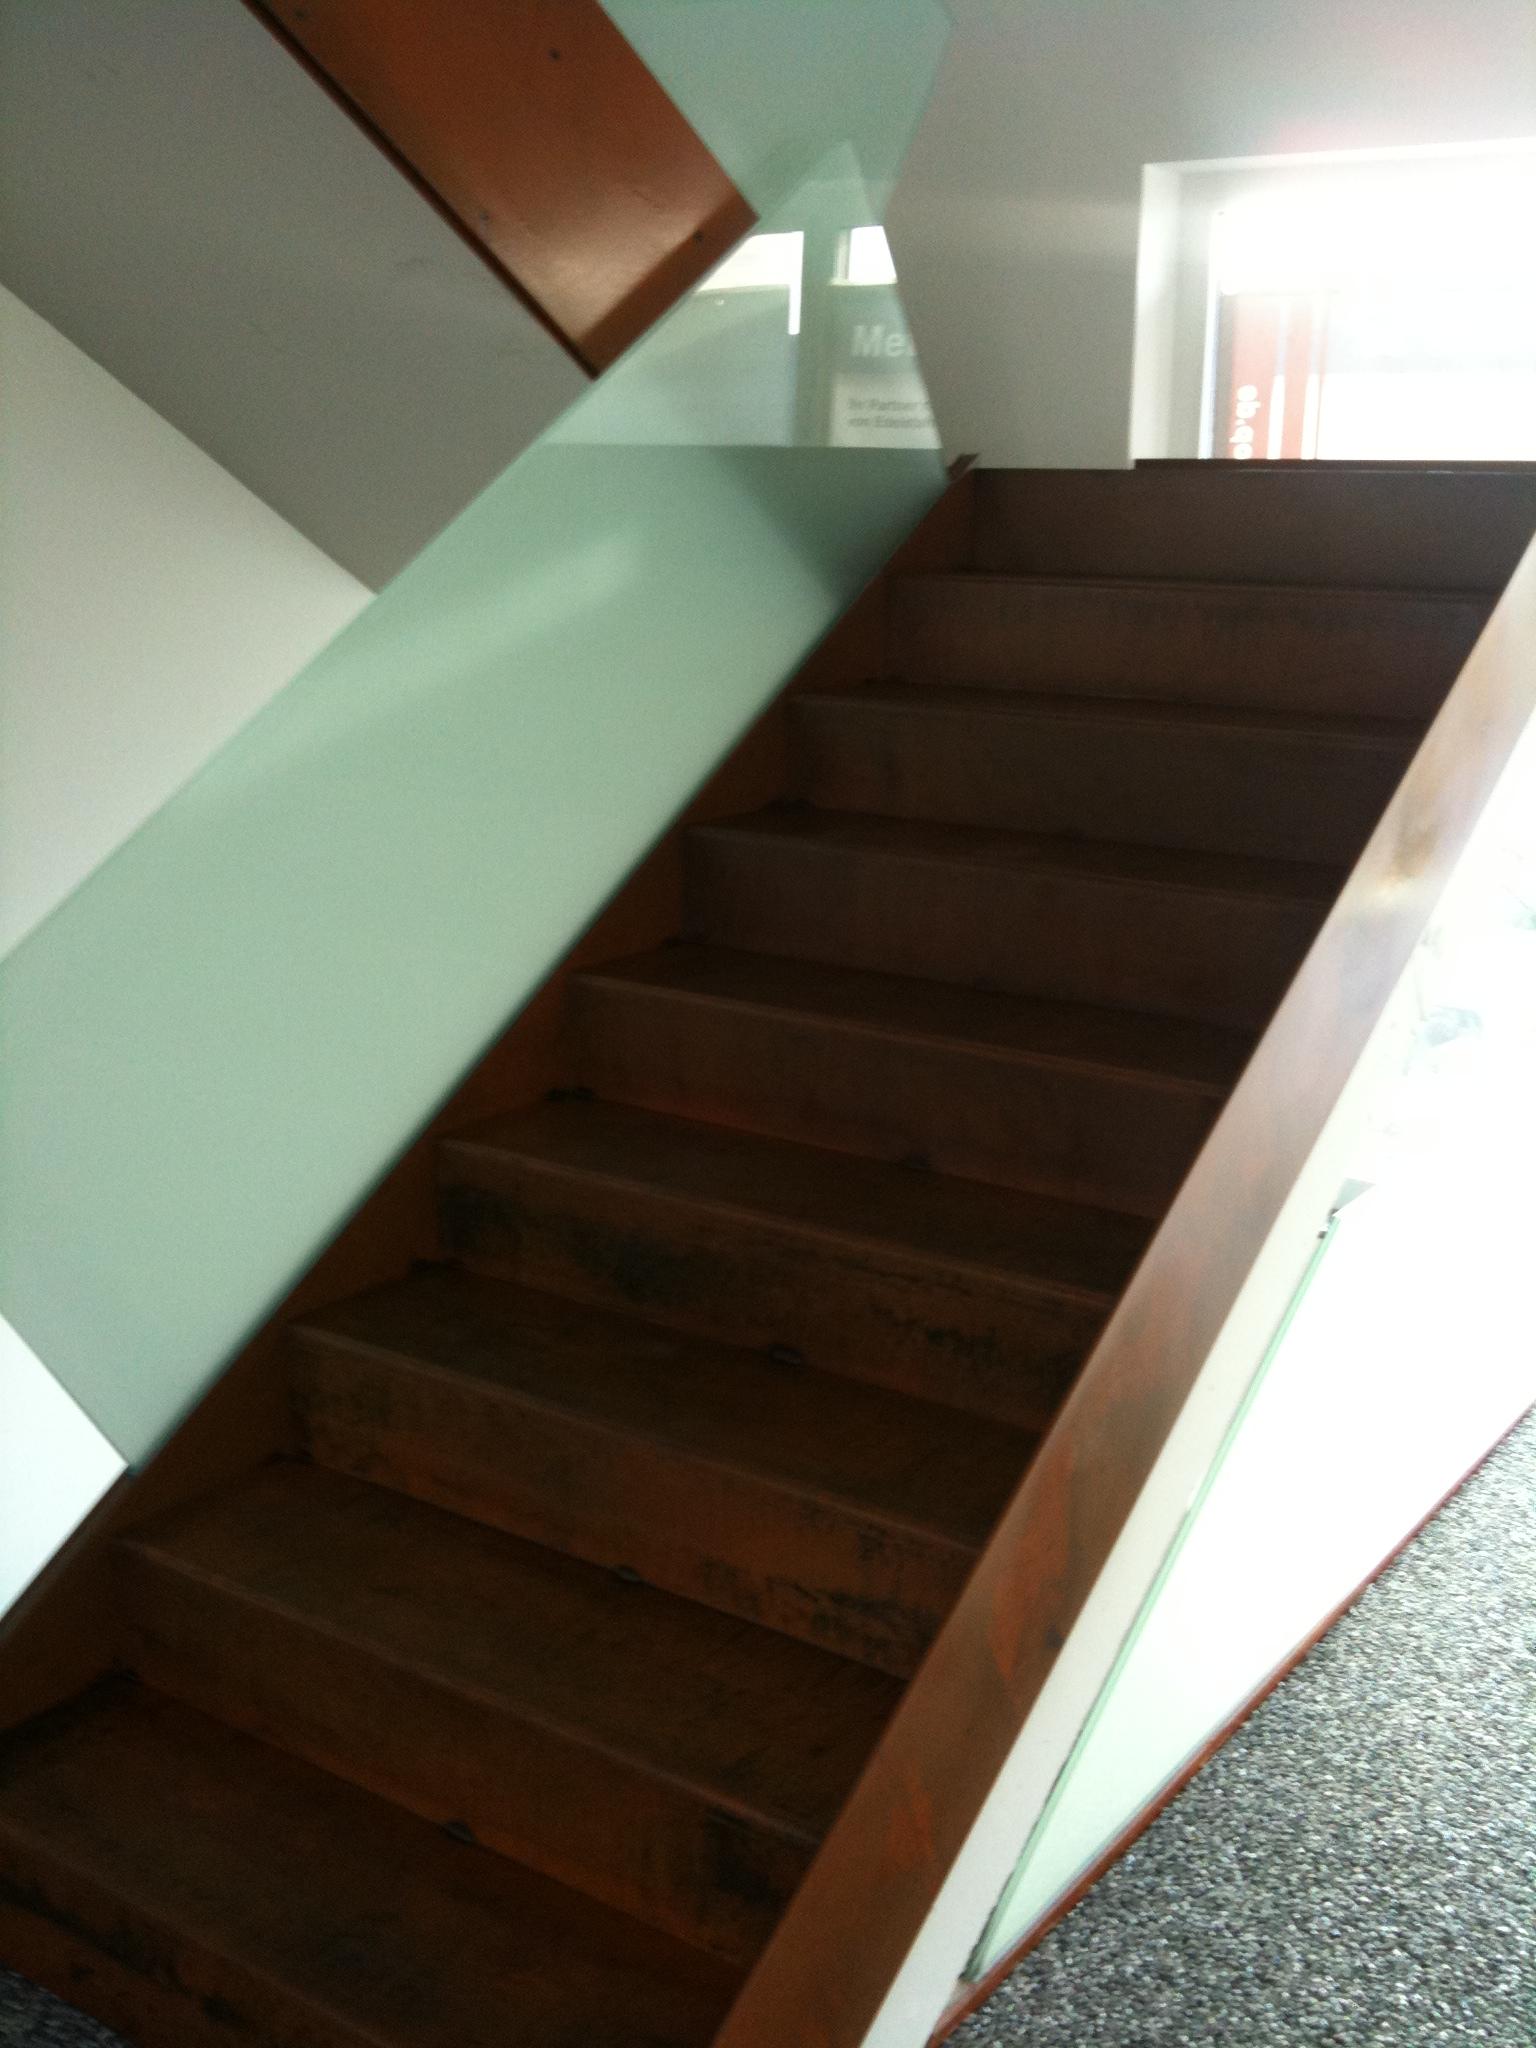 cor ten stahl faltwerktreppe preis auf anfrage metall kreativ ug shop. Black Bedroom Furniture Sets. Home Design Ideas